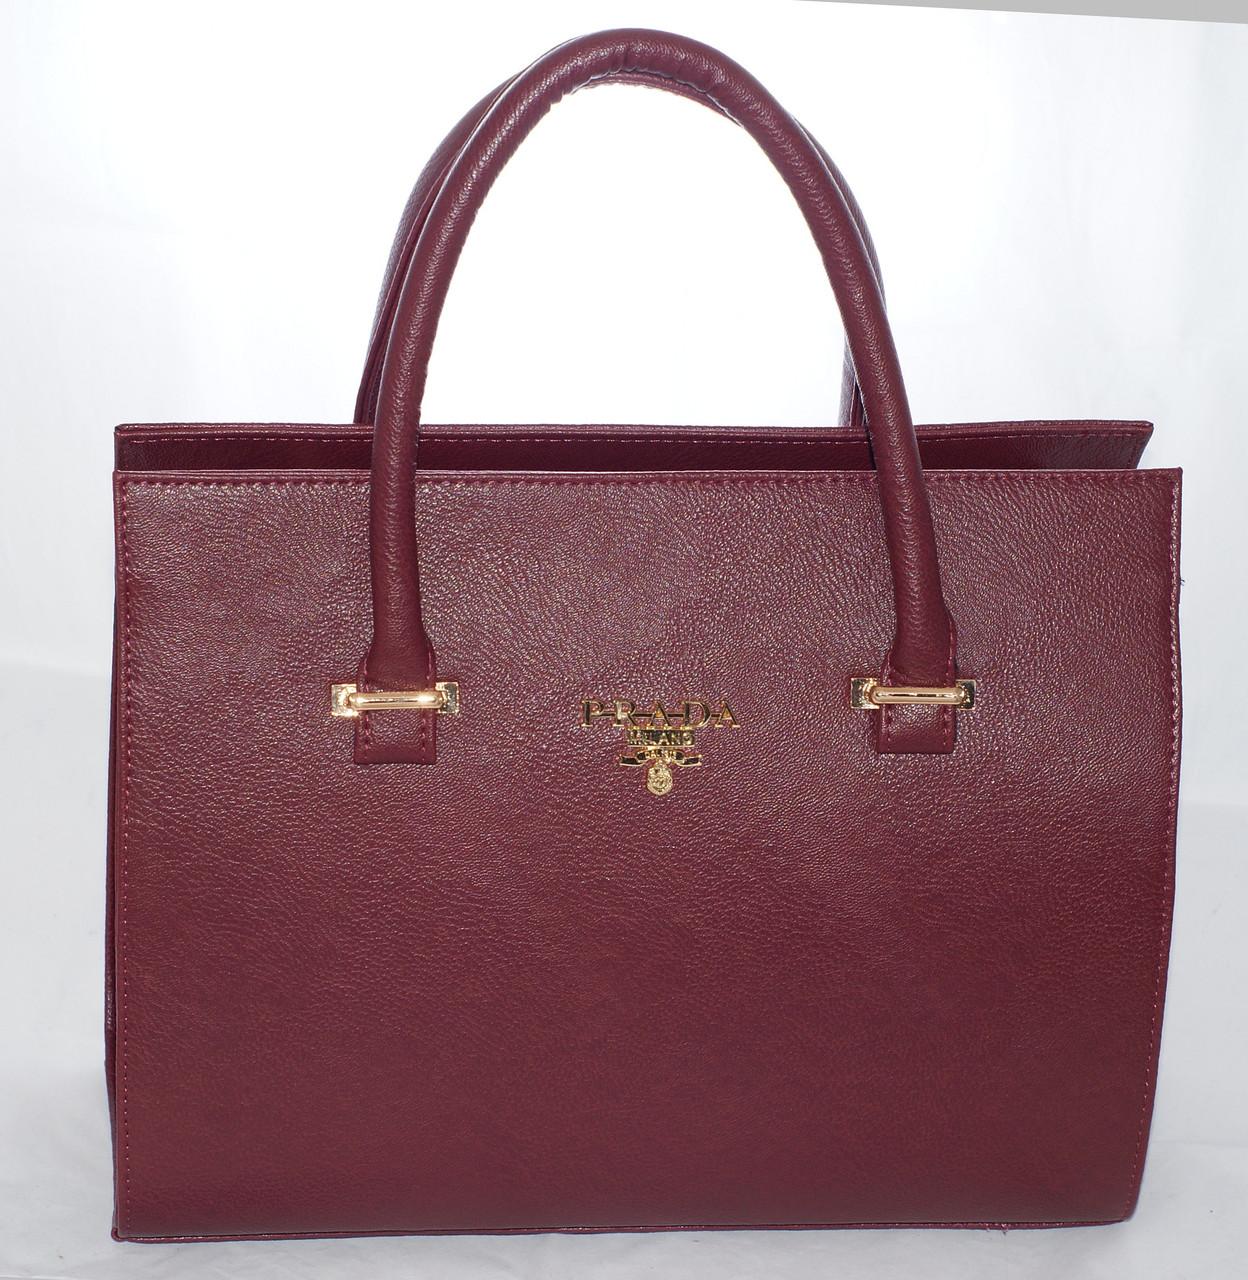 3e1948525769 Каркасная женская сумка Prada (Прада), бордовая: продажа, цена в ...